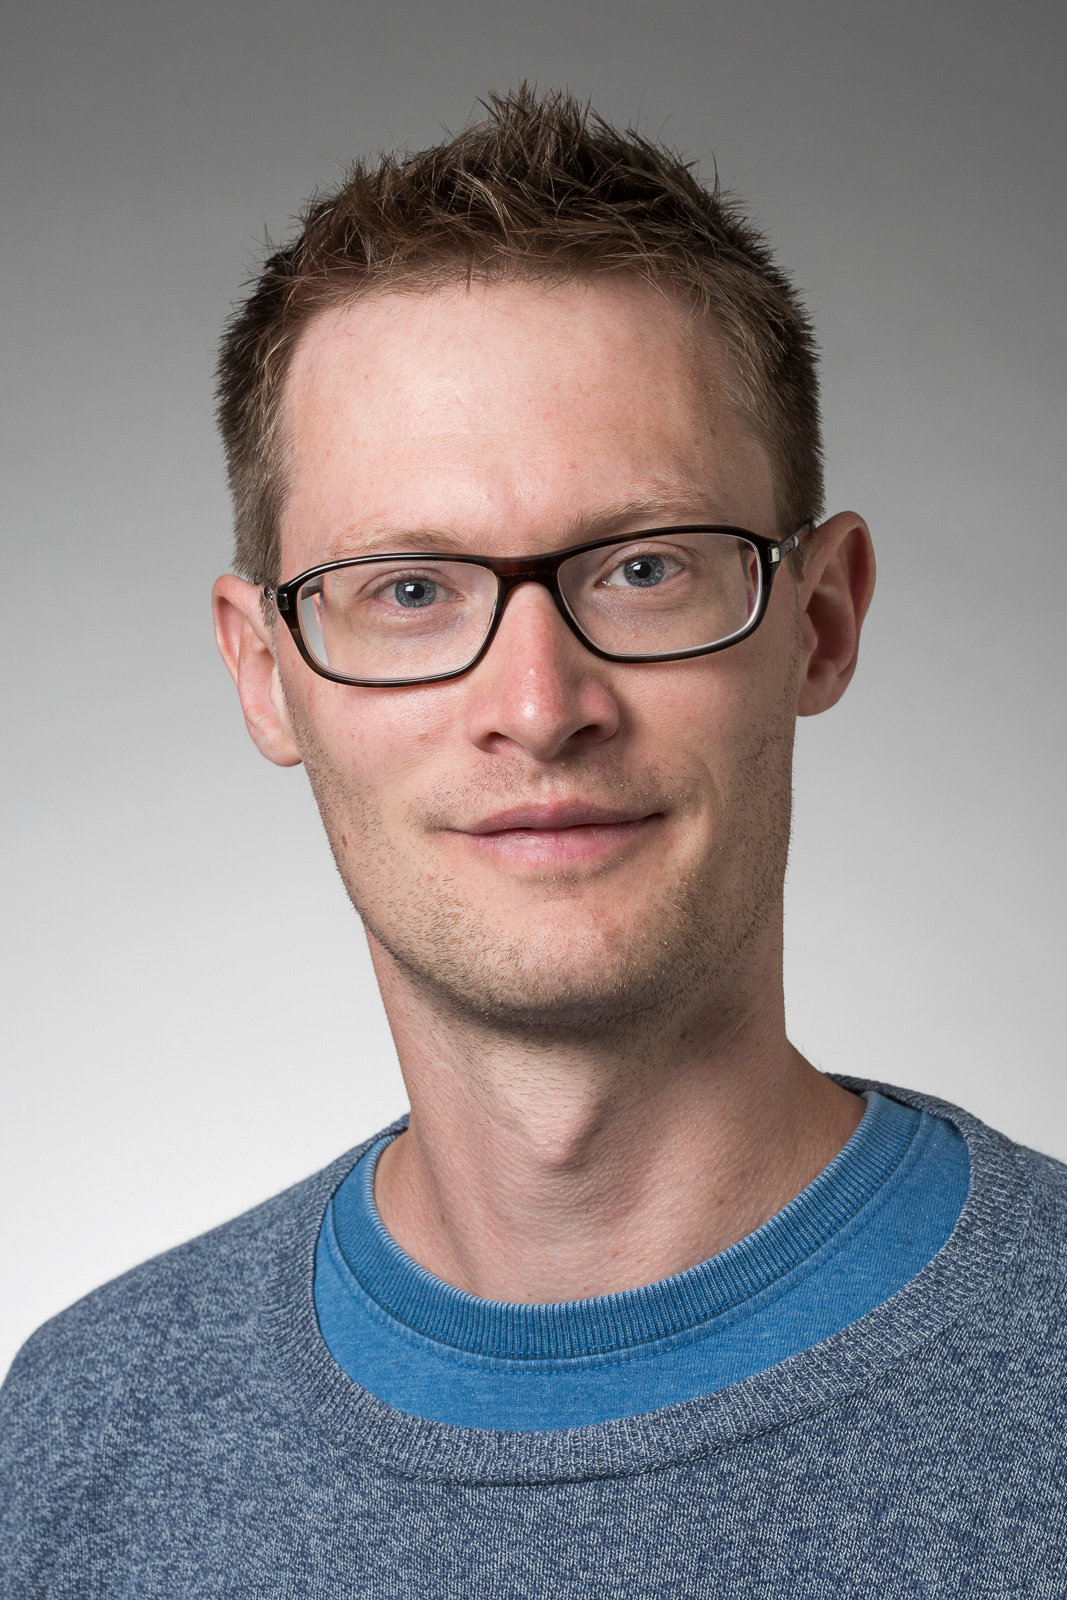 Jesper Erenskjold Moeslund